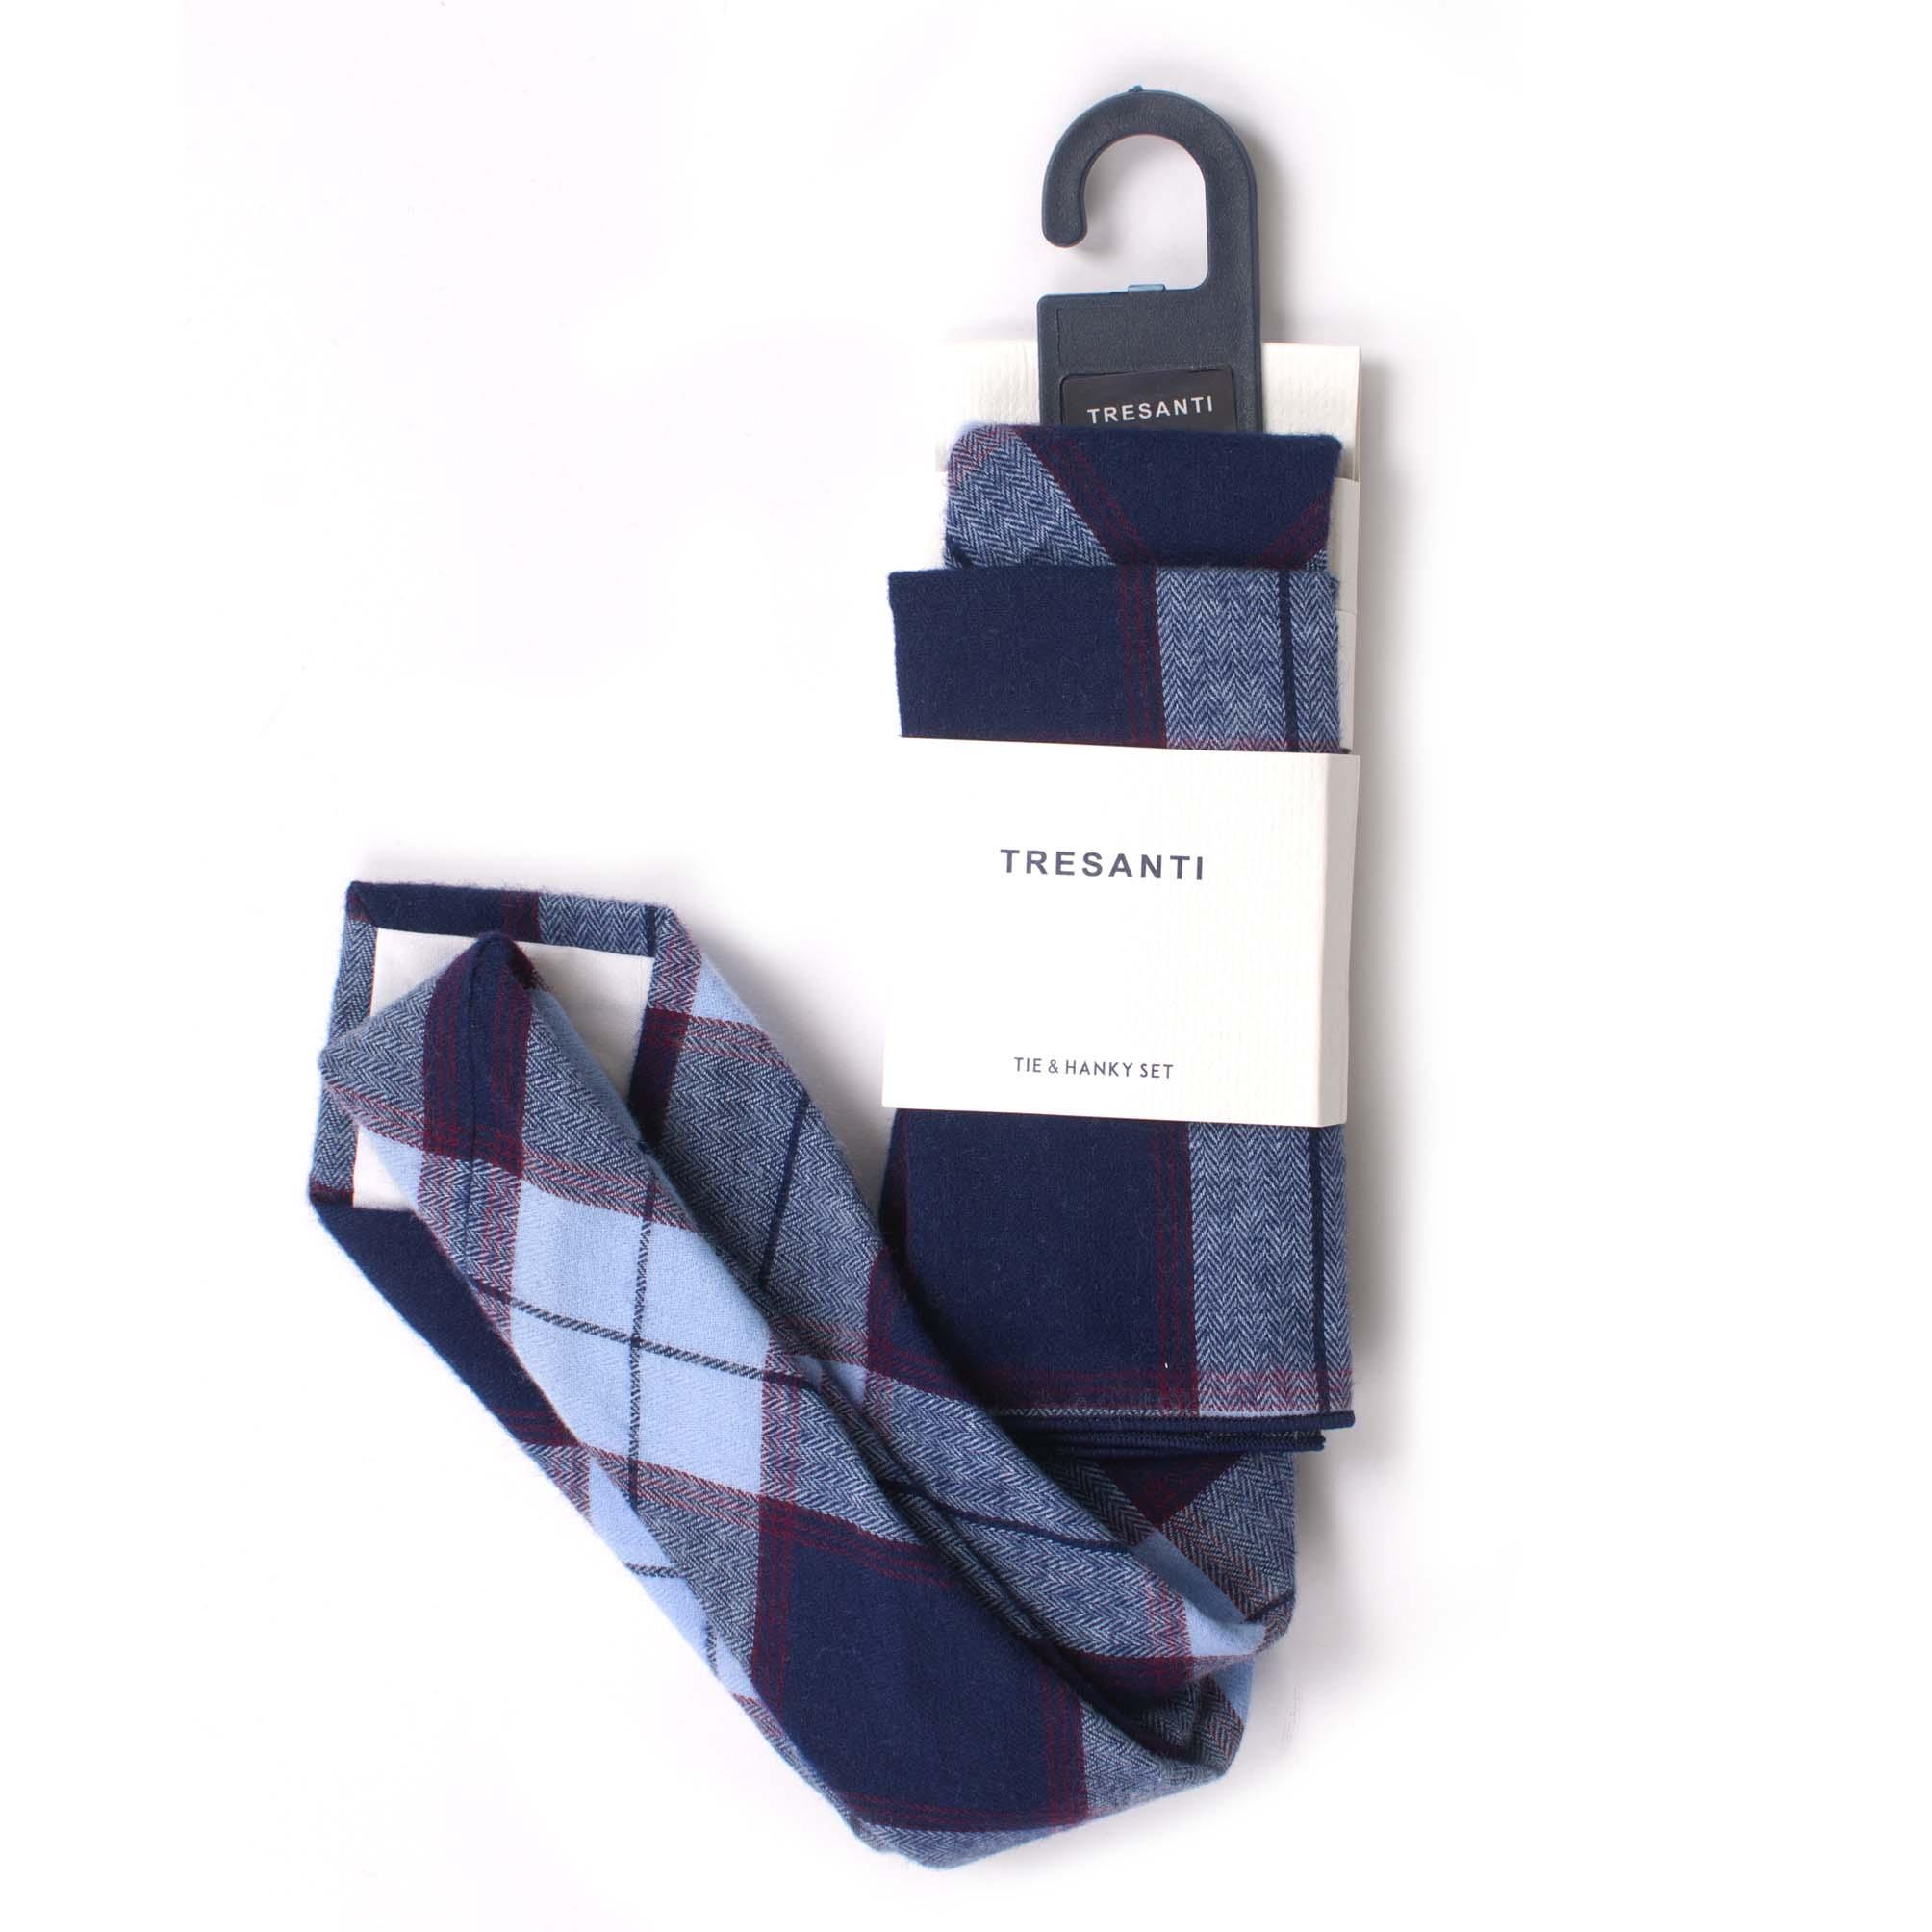 Cotton set tie & hanky check design